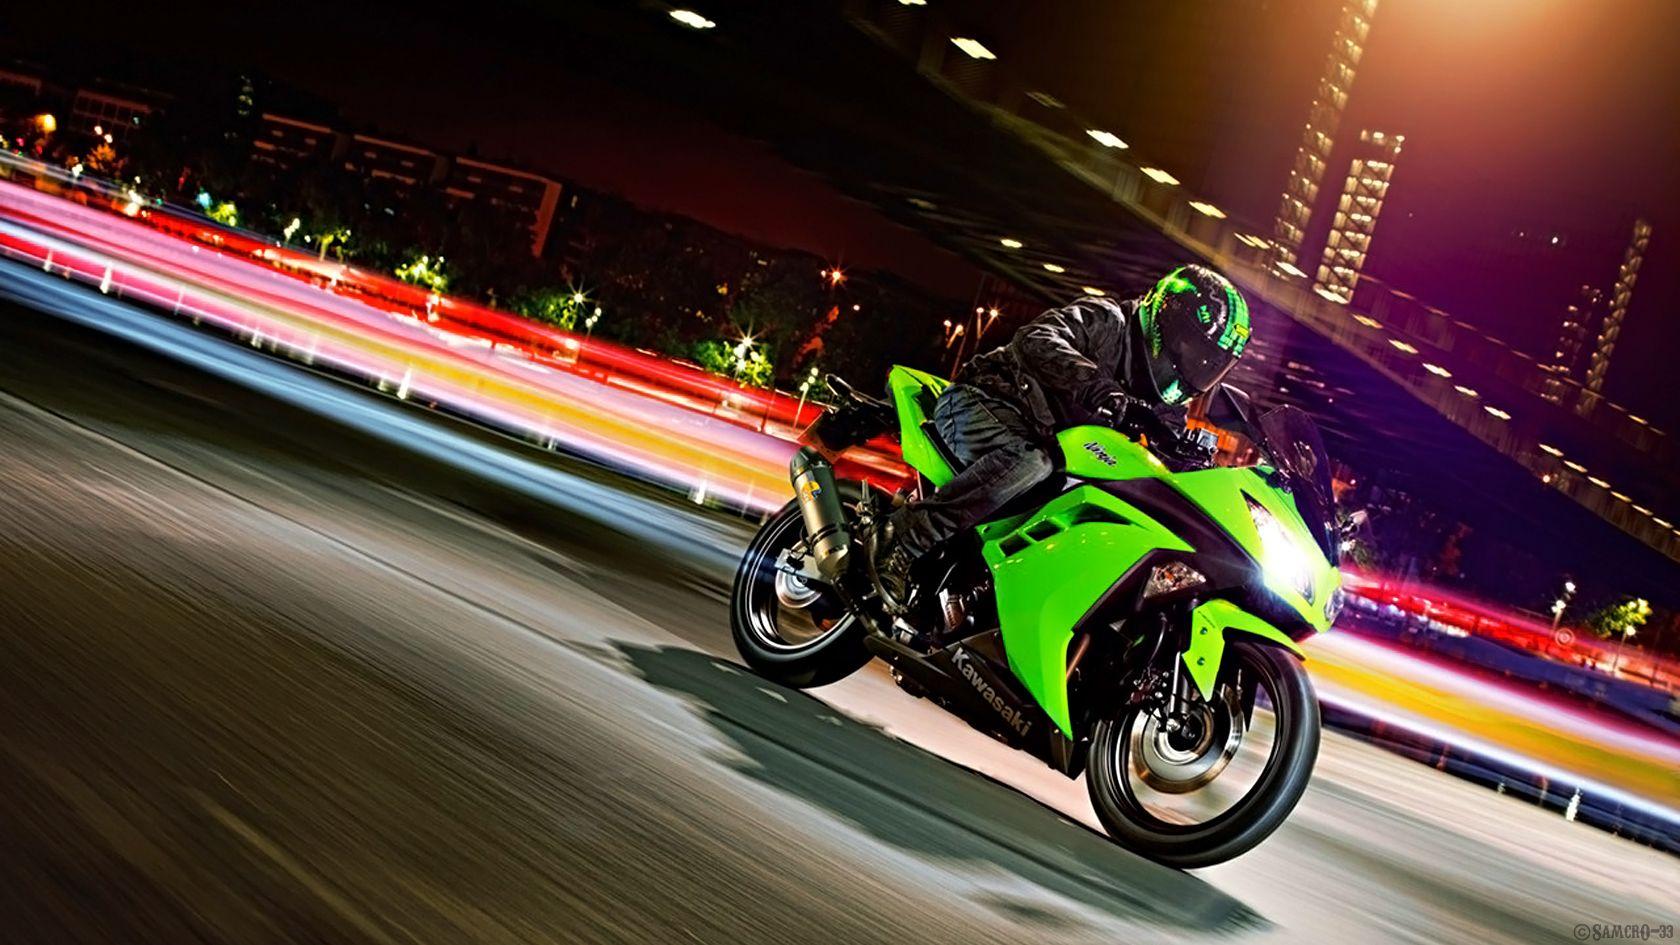 Kawasaki Ninja 300 Wallpaper Hd Kawasaki Ninja 300 Ninja Bike 2013 Kawasaki Ninja 300